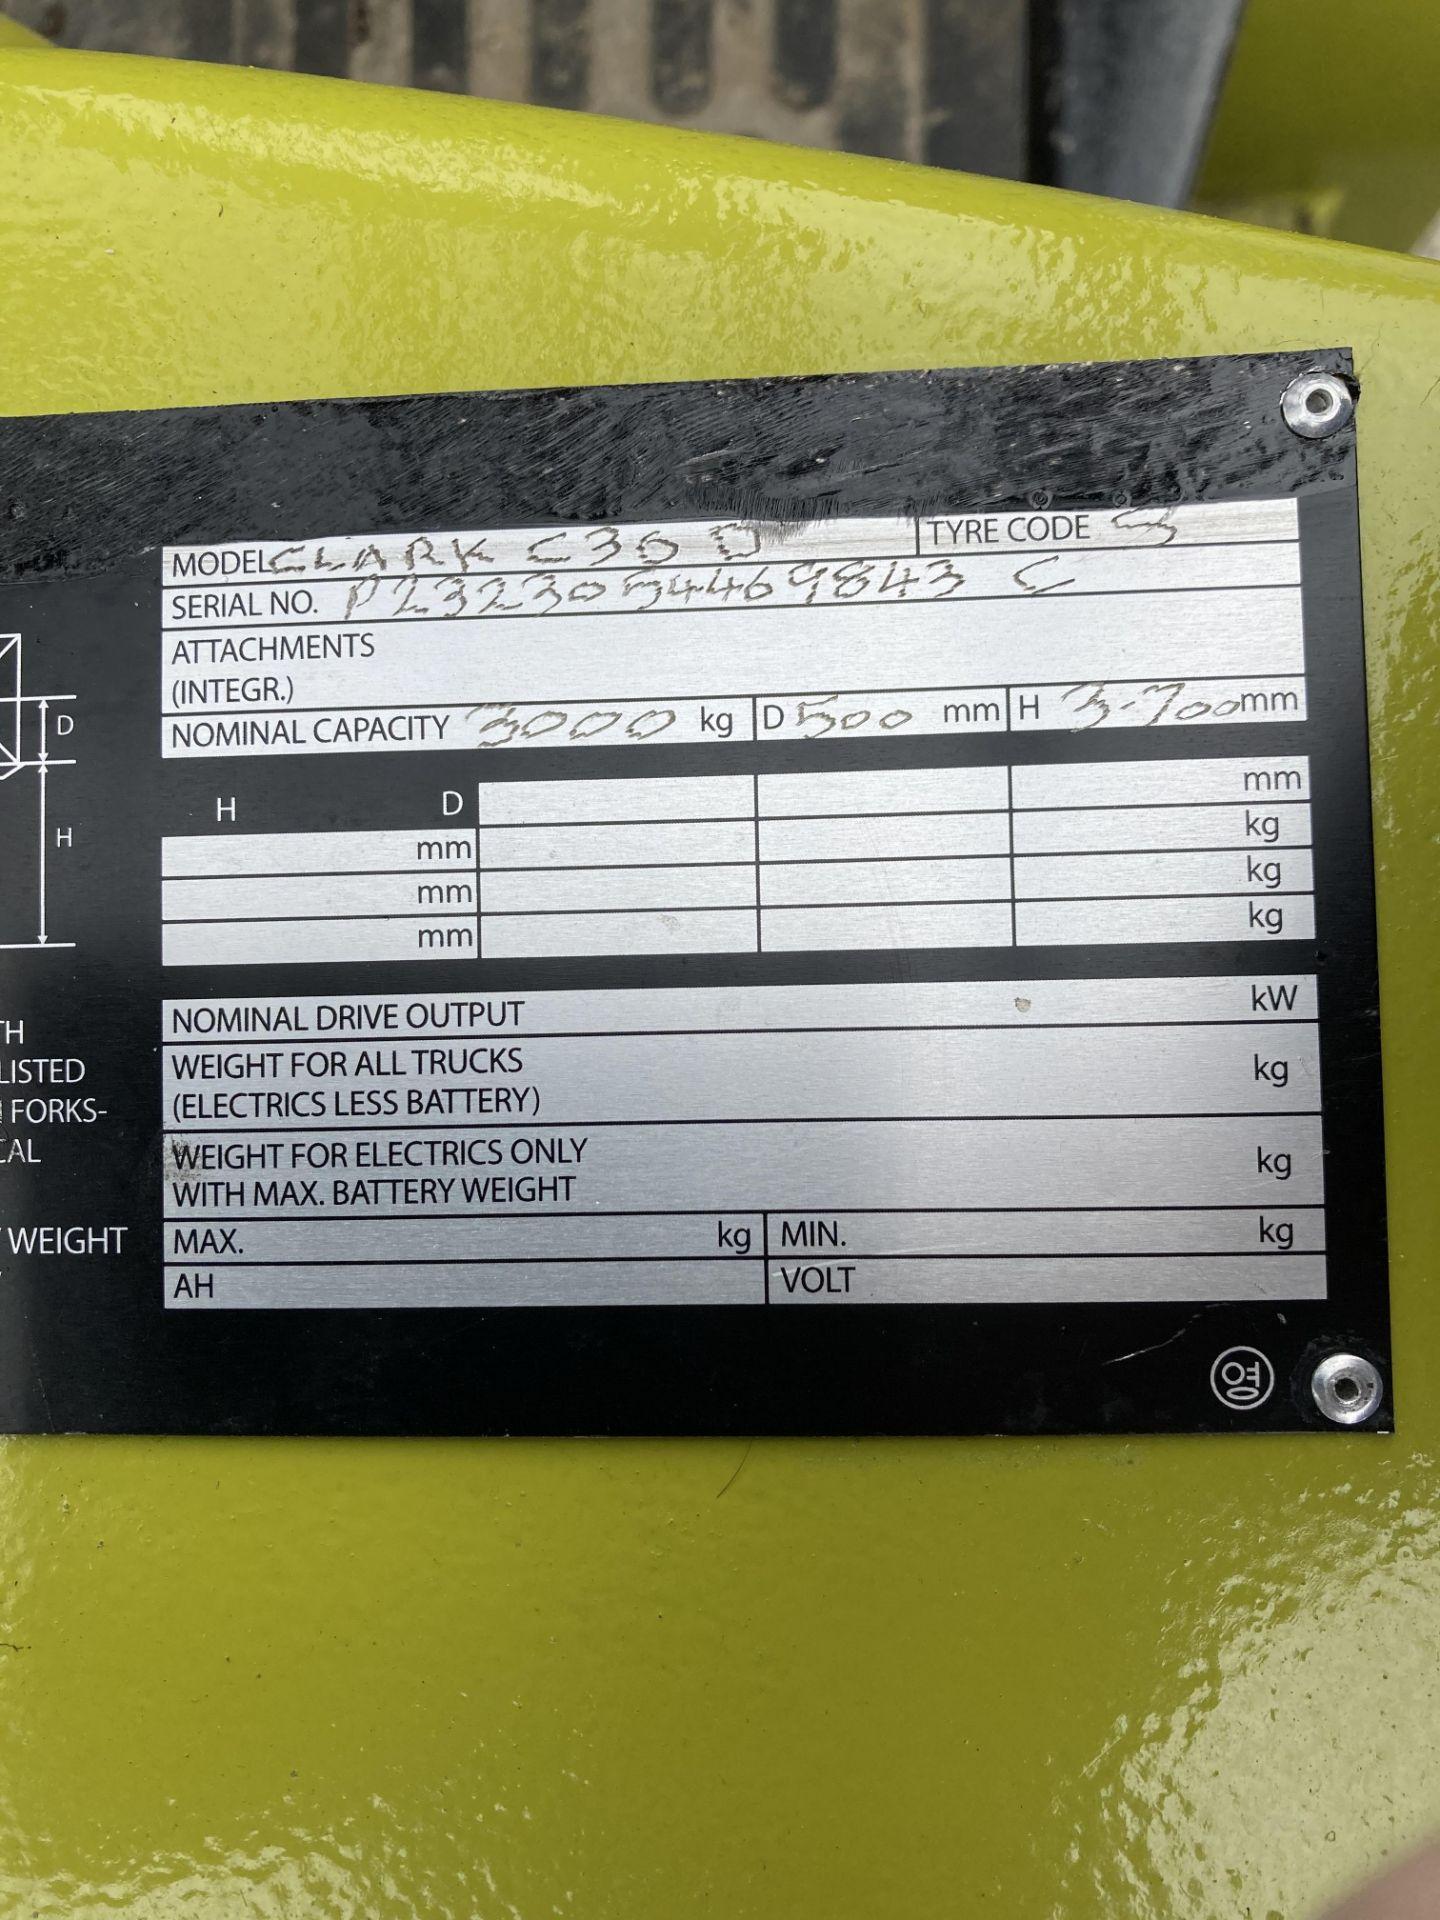 CLARK C30D DIESEL 3T FORKTRUCK Lift height: 3725mm Fork length: 1500mm YOM: 2012 Serial No: - Image 4 of 5